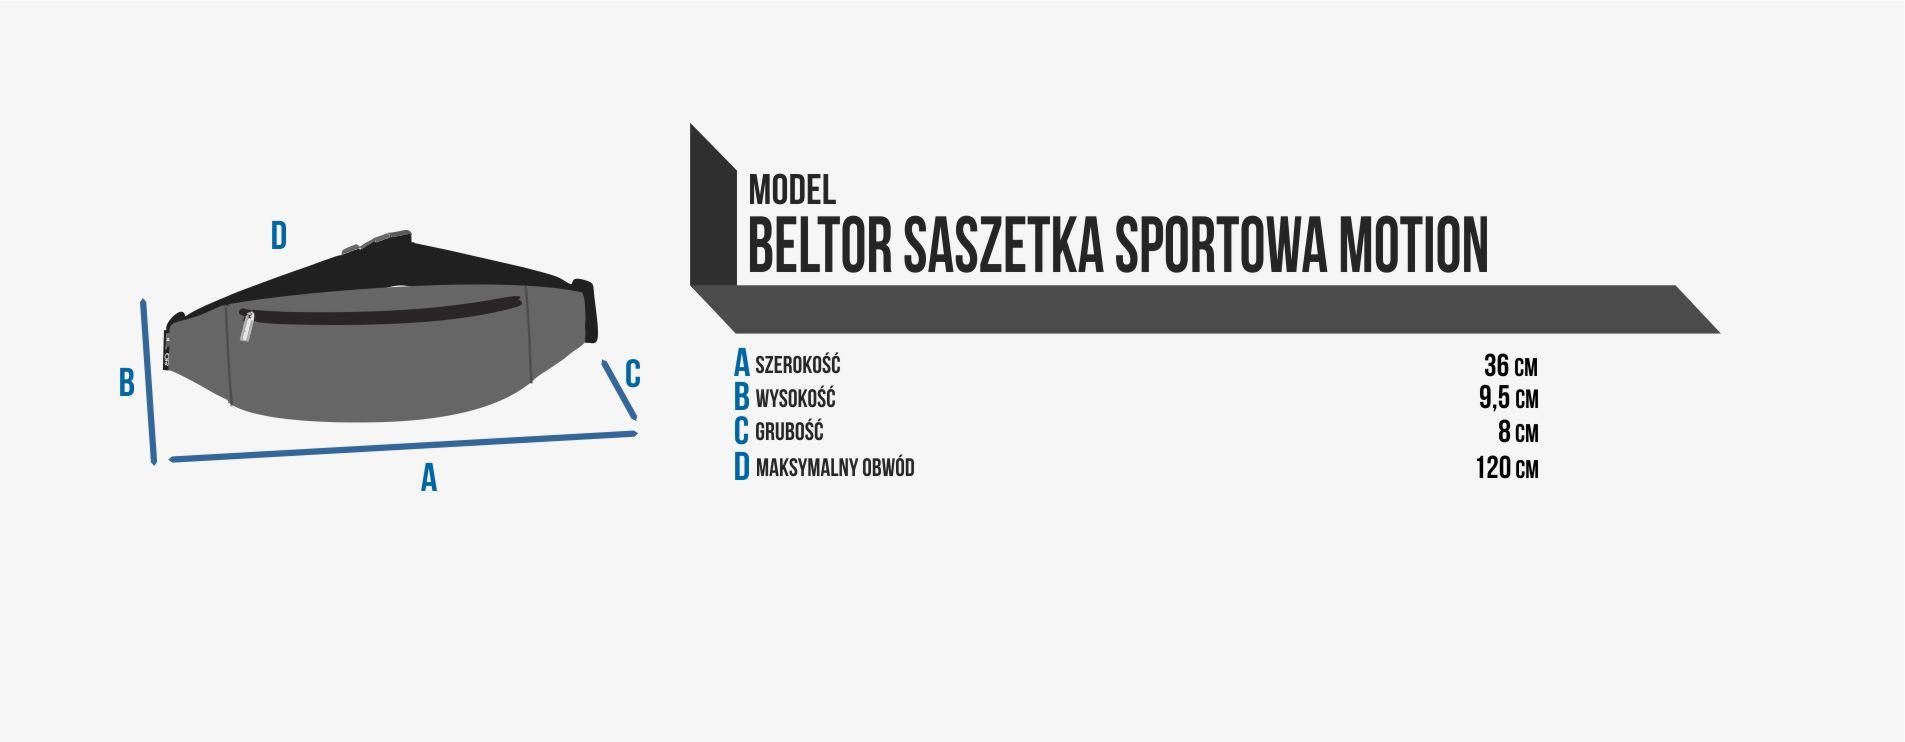 beltor-saszetka-sportowa-motion1